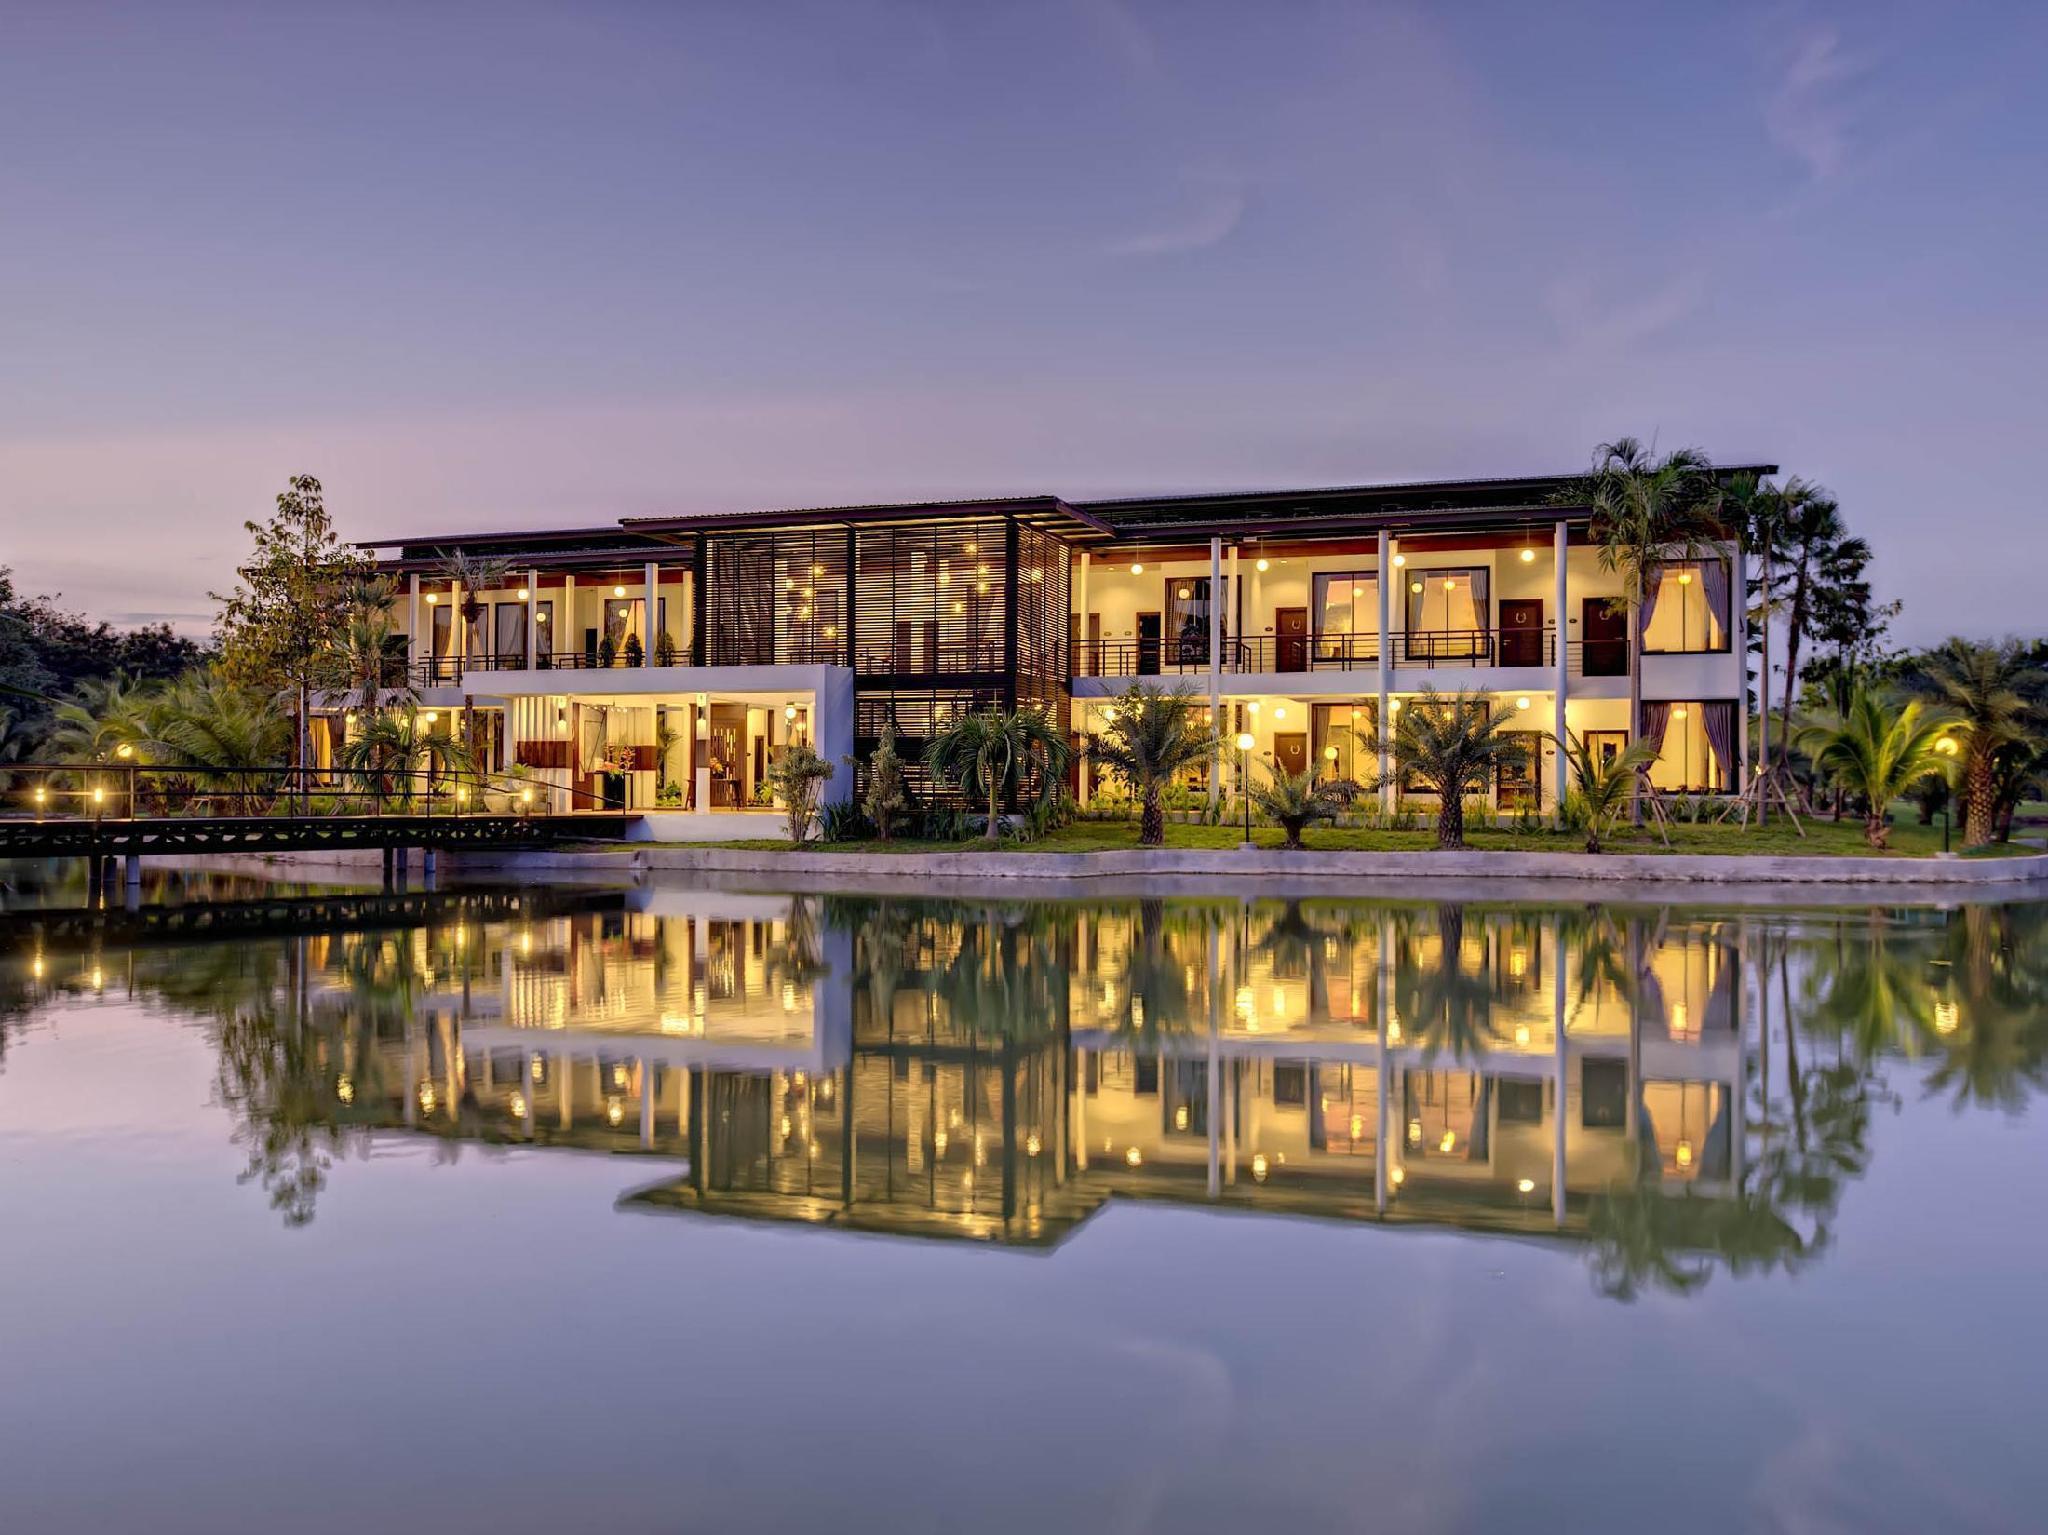 Horizon Village & Resort ฮอไรซอน วิลเลจ แอนด์ รีสอร์ท